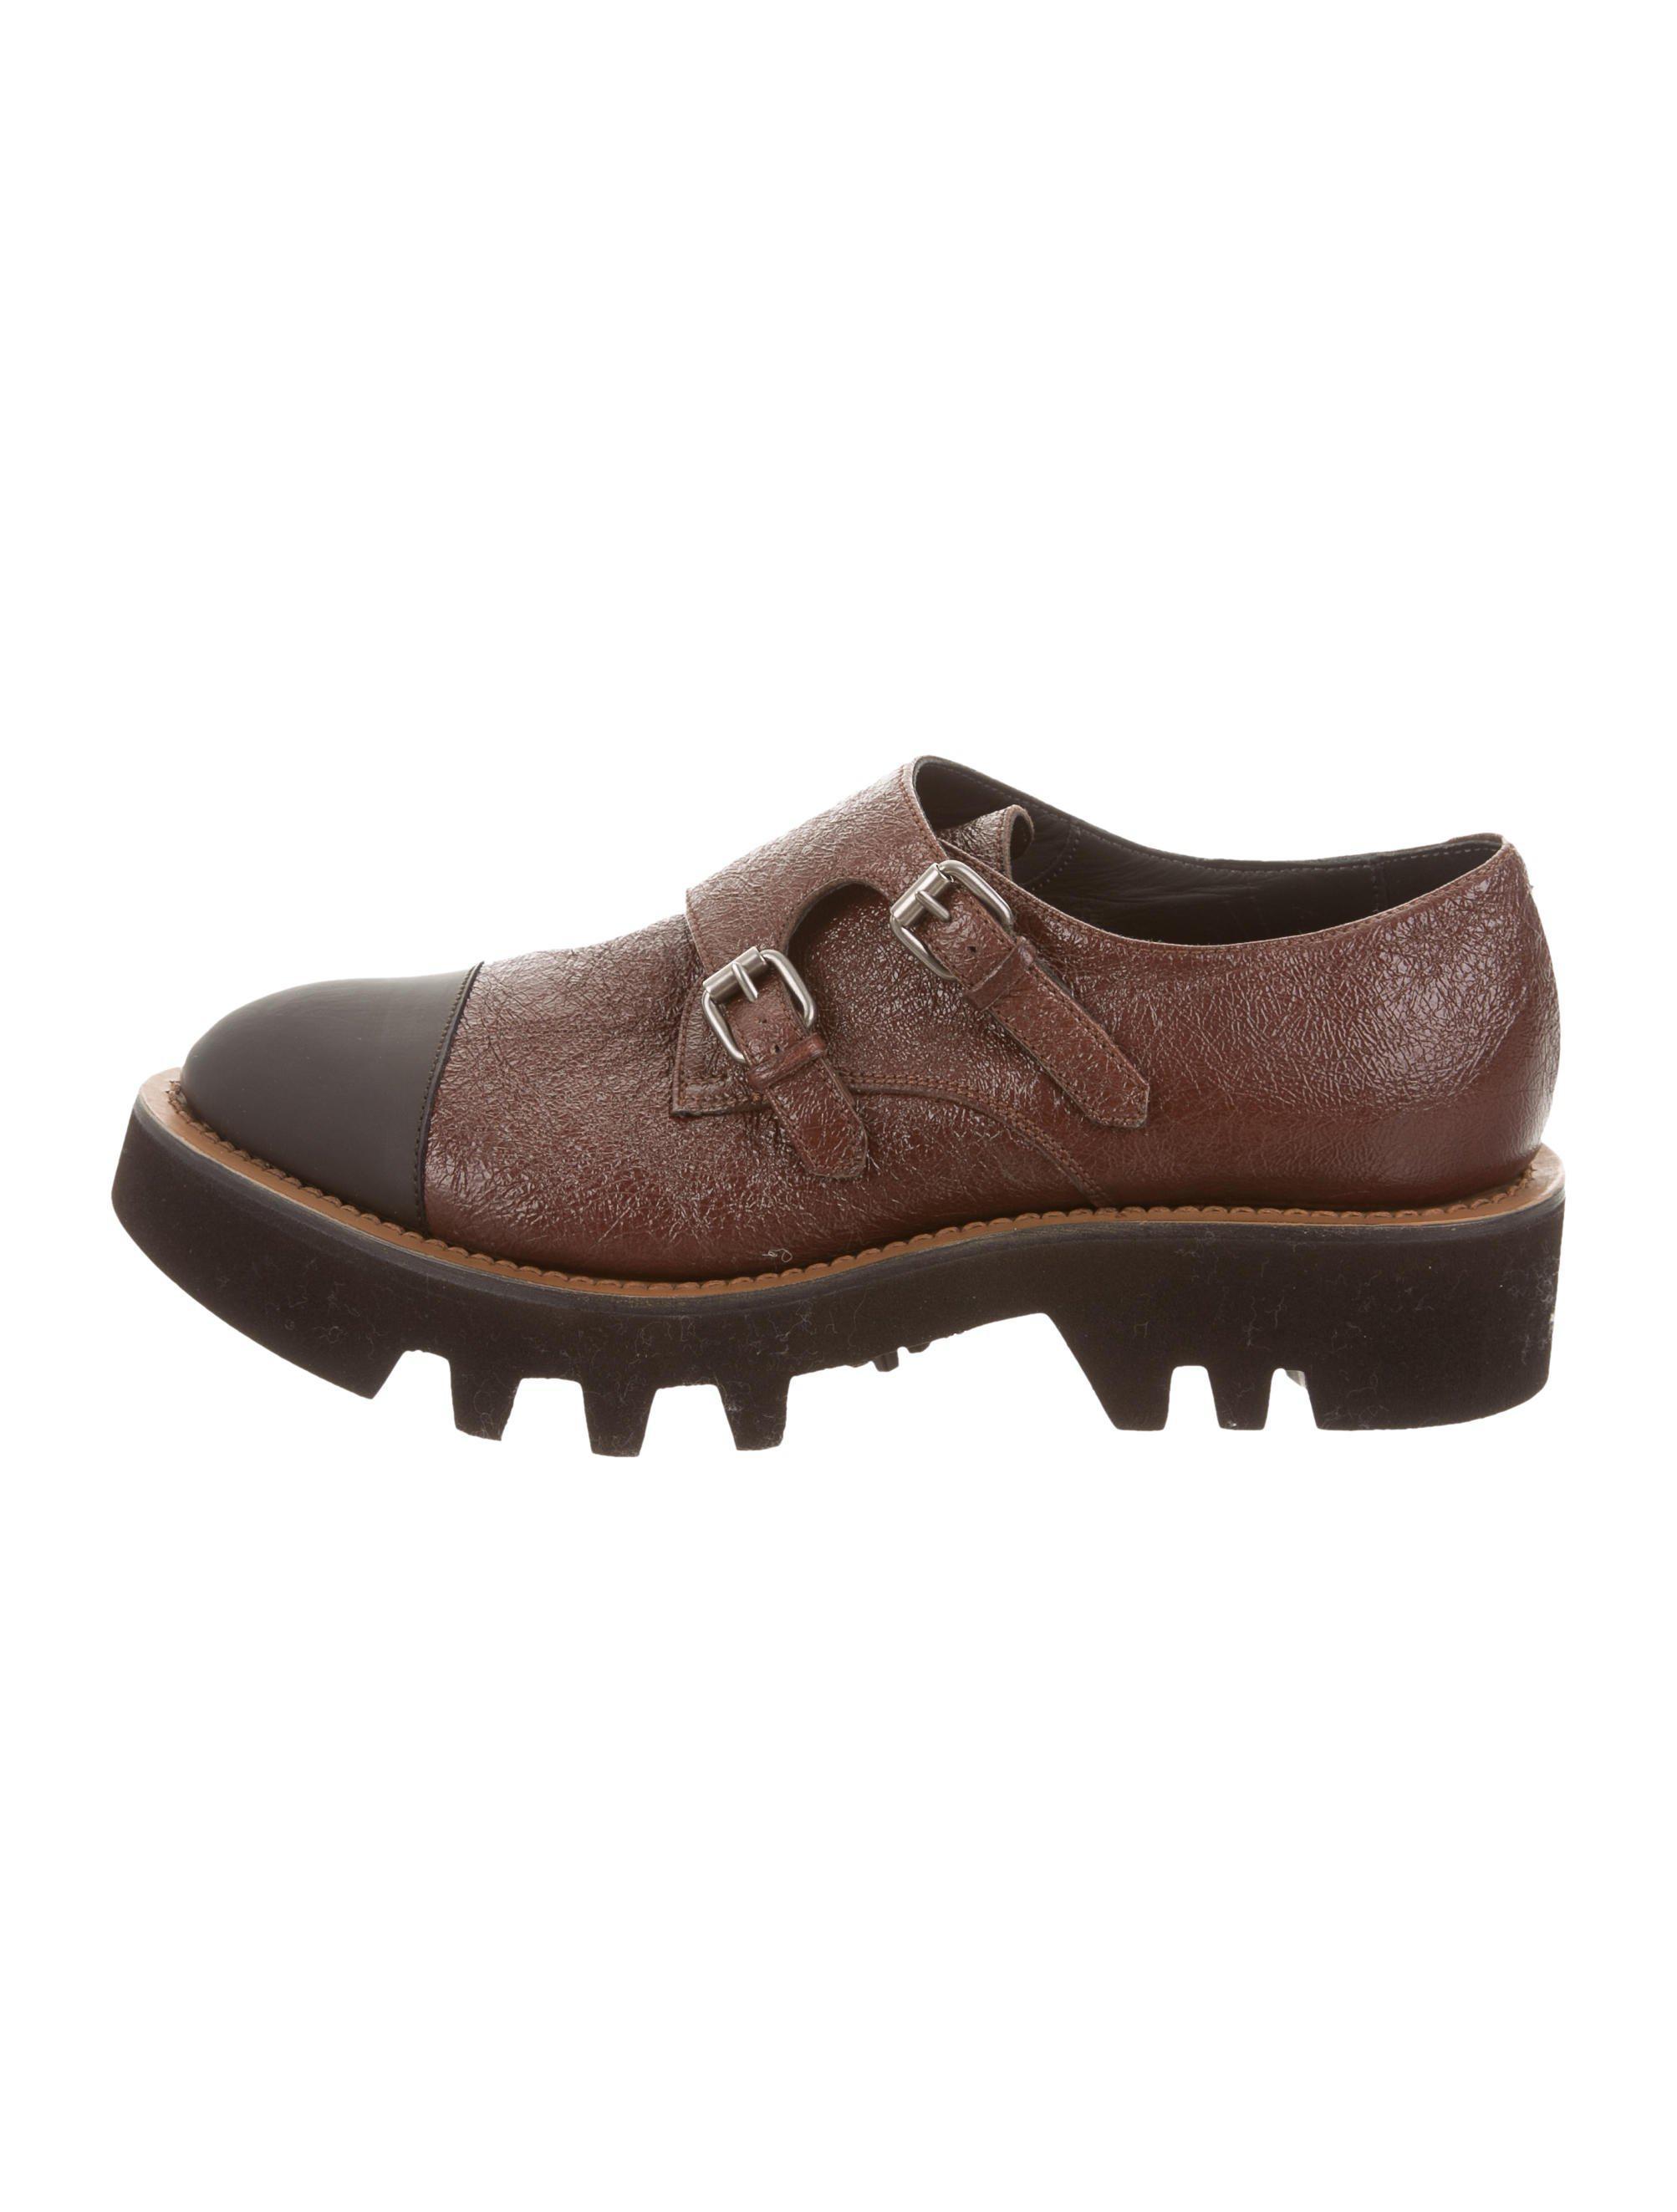 cheap price original Brunello Cucinelli Leather Flatform Loafers w/ Tags cheap sale enjoy for sale cheap authentic 2QDVr9dcU